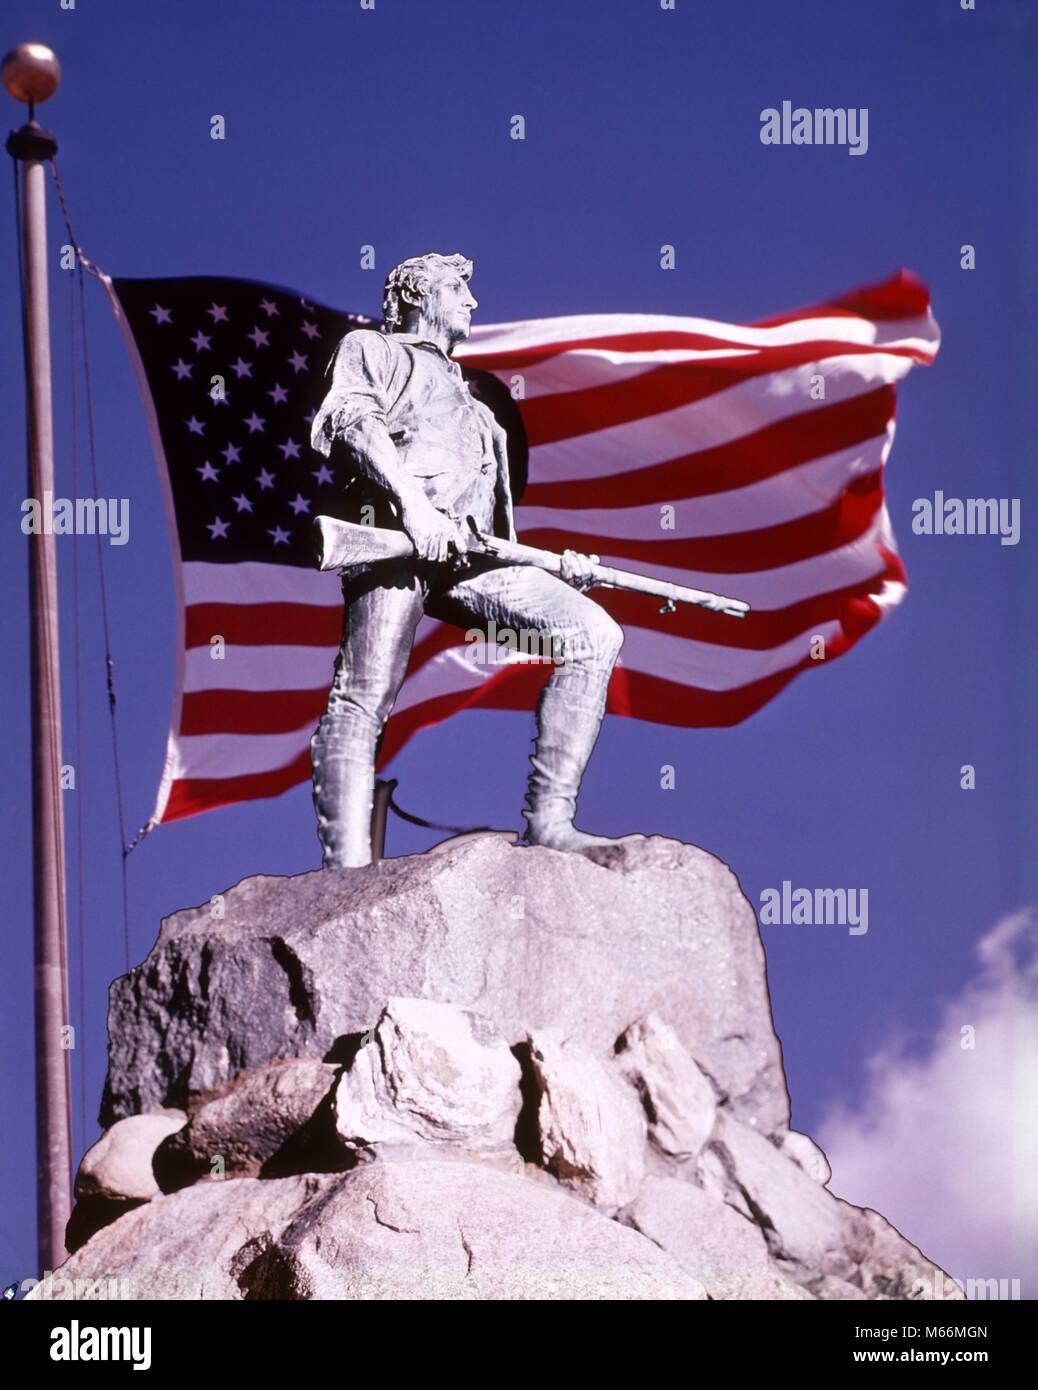 THE LEXINGTON MINUTEMAN STATUE SUPERIMPOSED ON AMERICAN FLAG AGAINST BLUE SKY LEXINGTON BATTLE GREEN MASSACHUSETTS USA - kh2852 HAR001 HARS CITIZEN EXCITEMENT PRIDE 1776 PATRIOT POLITICS WAR OF INDEPENDENCE CONCEPTUAL LEXINGTON PATRIOTIC REVOLT AMERICAN REVOLUTIONARY WAR SYMBOLIC 1770s CAPTAIN JOHN PARKER COLONIES CONCORD FIREARM FIREARMS MALES MINUTEMAN NATIONAL HISTORIC LANDMARK PATRIOTISM RED WHITE AND BLUE STATUES 1775 AMERICAN FLAG APRIL 1775 APRIL 19 BATTLE OF LEXINGTON BATTLES HENRY HUDSON KITSON LEXINGTON BATTLE GREEN LEXINGTON COMMON MILITIA MINUTEMEN OLD FASHIONED PERSONS Stock Photo